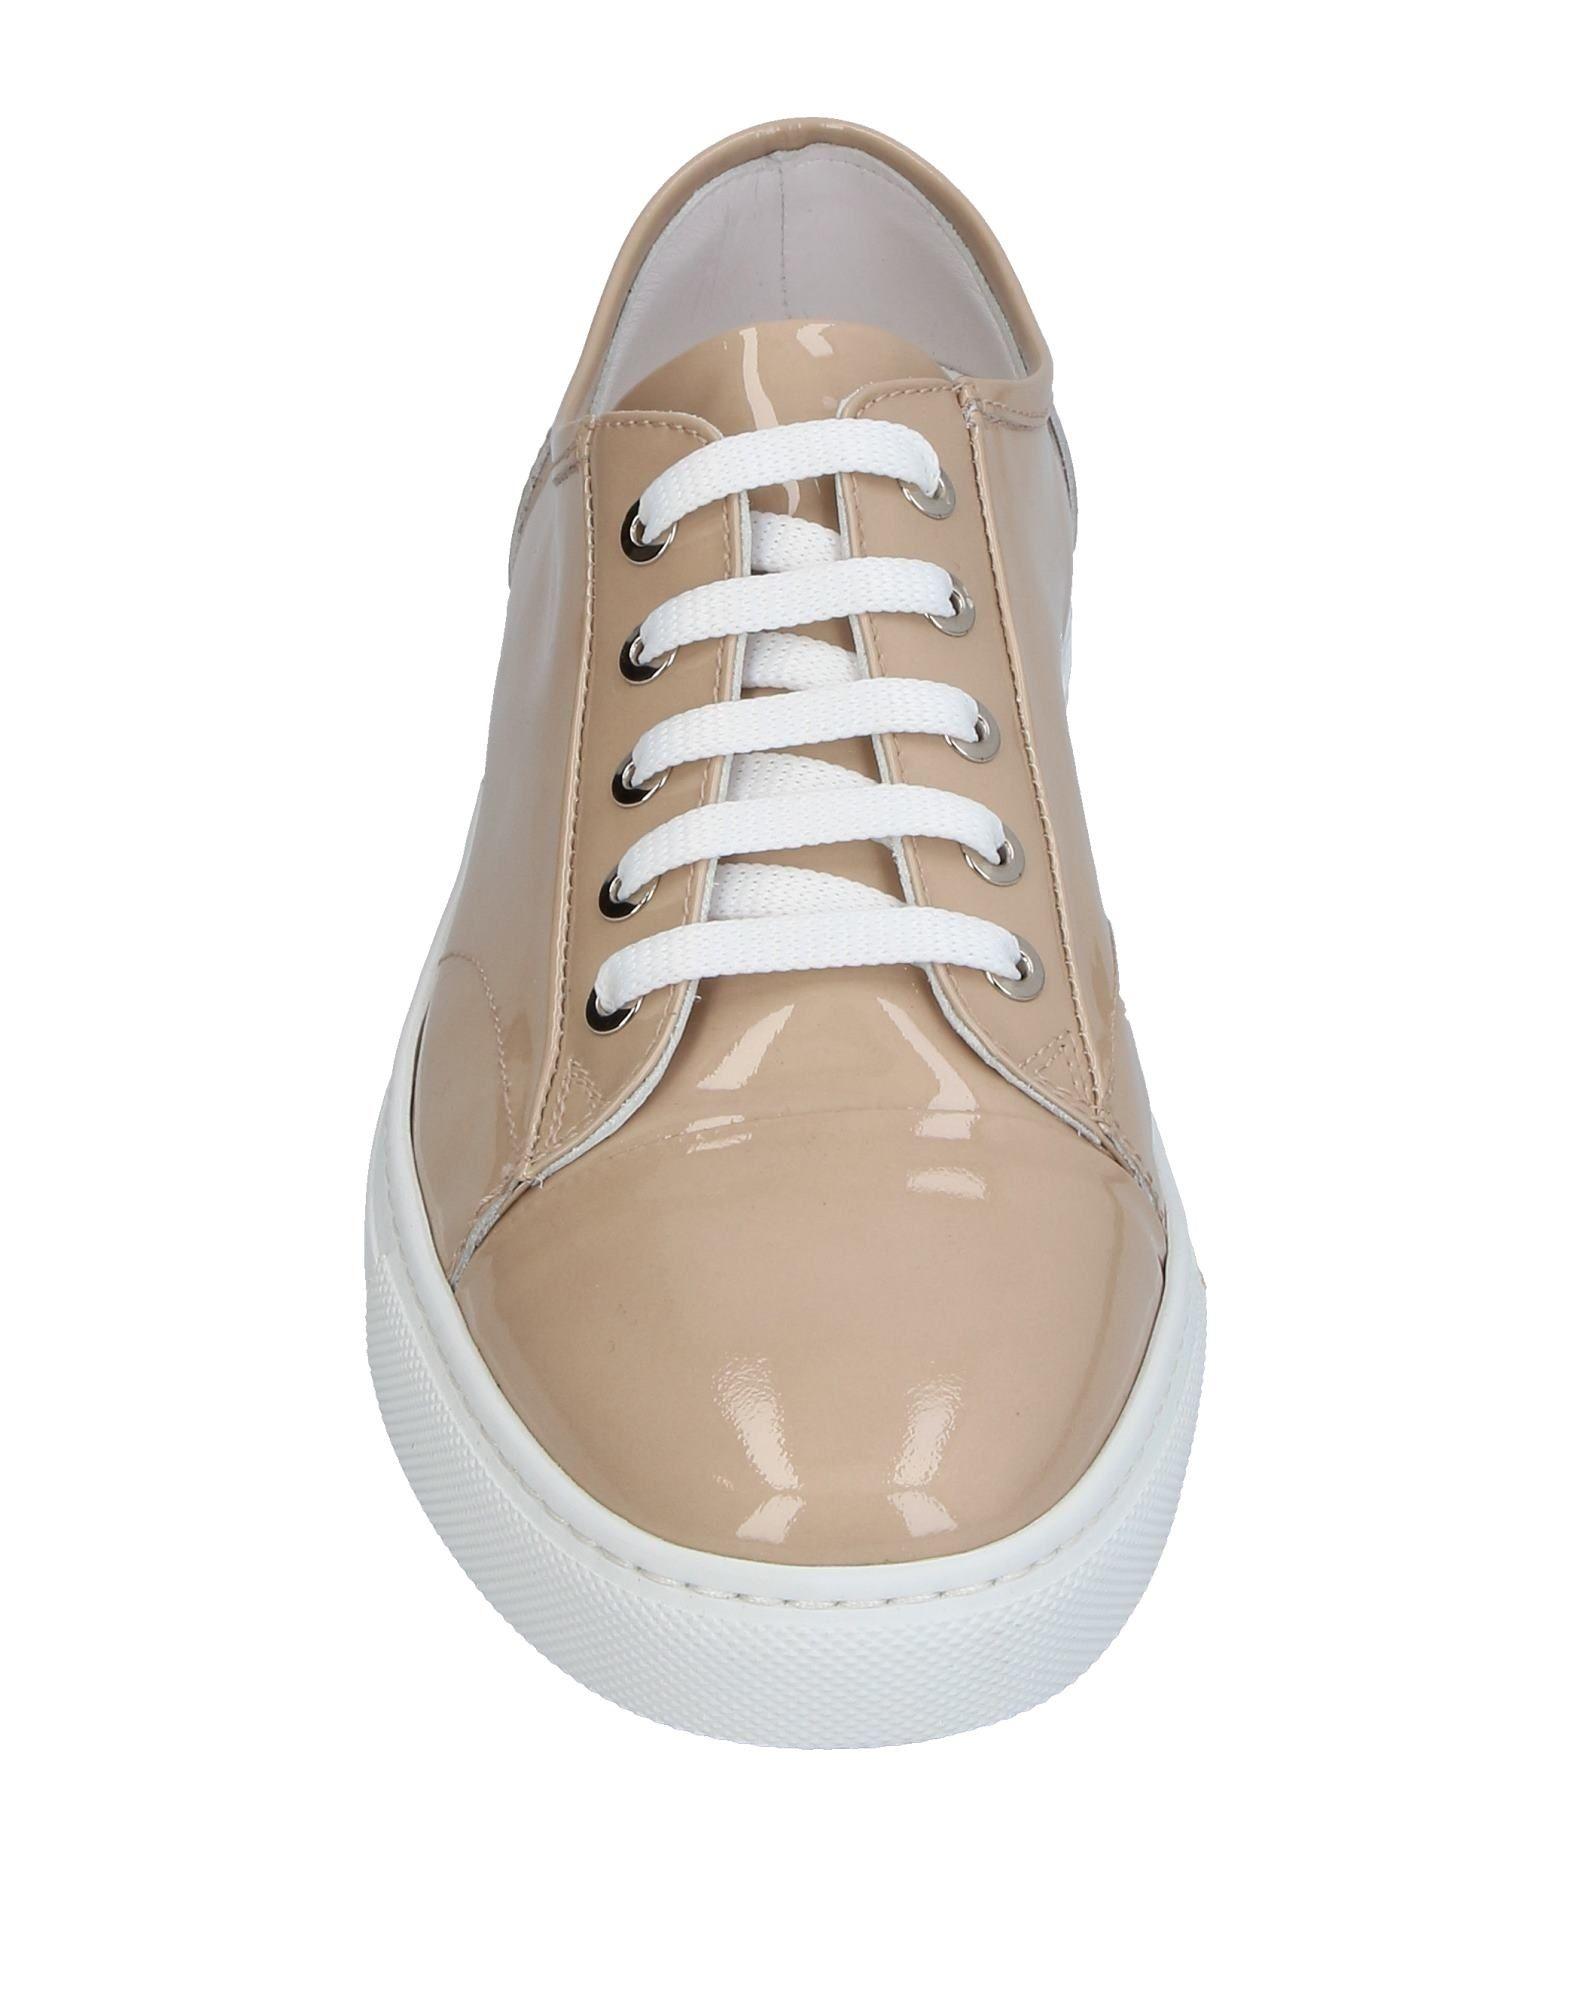 Gut tragenGianfranco um billige Schuhe zu tragenGianfranco Gut Lattanzi Sneakers Damen  11386435SG efeae9